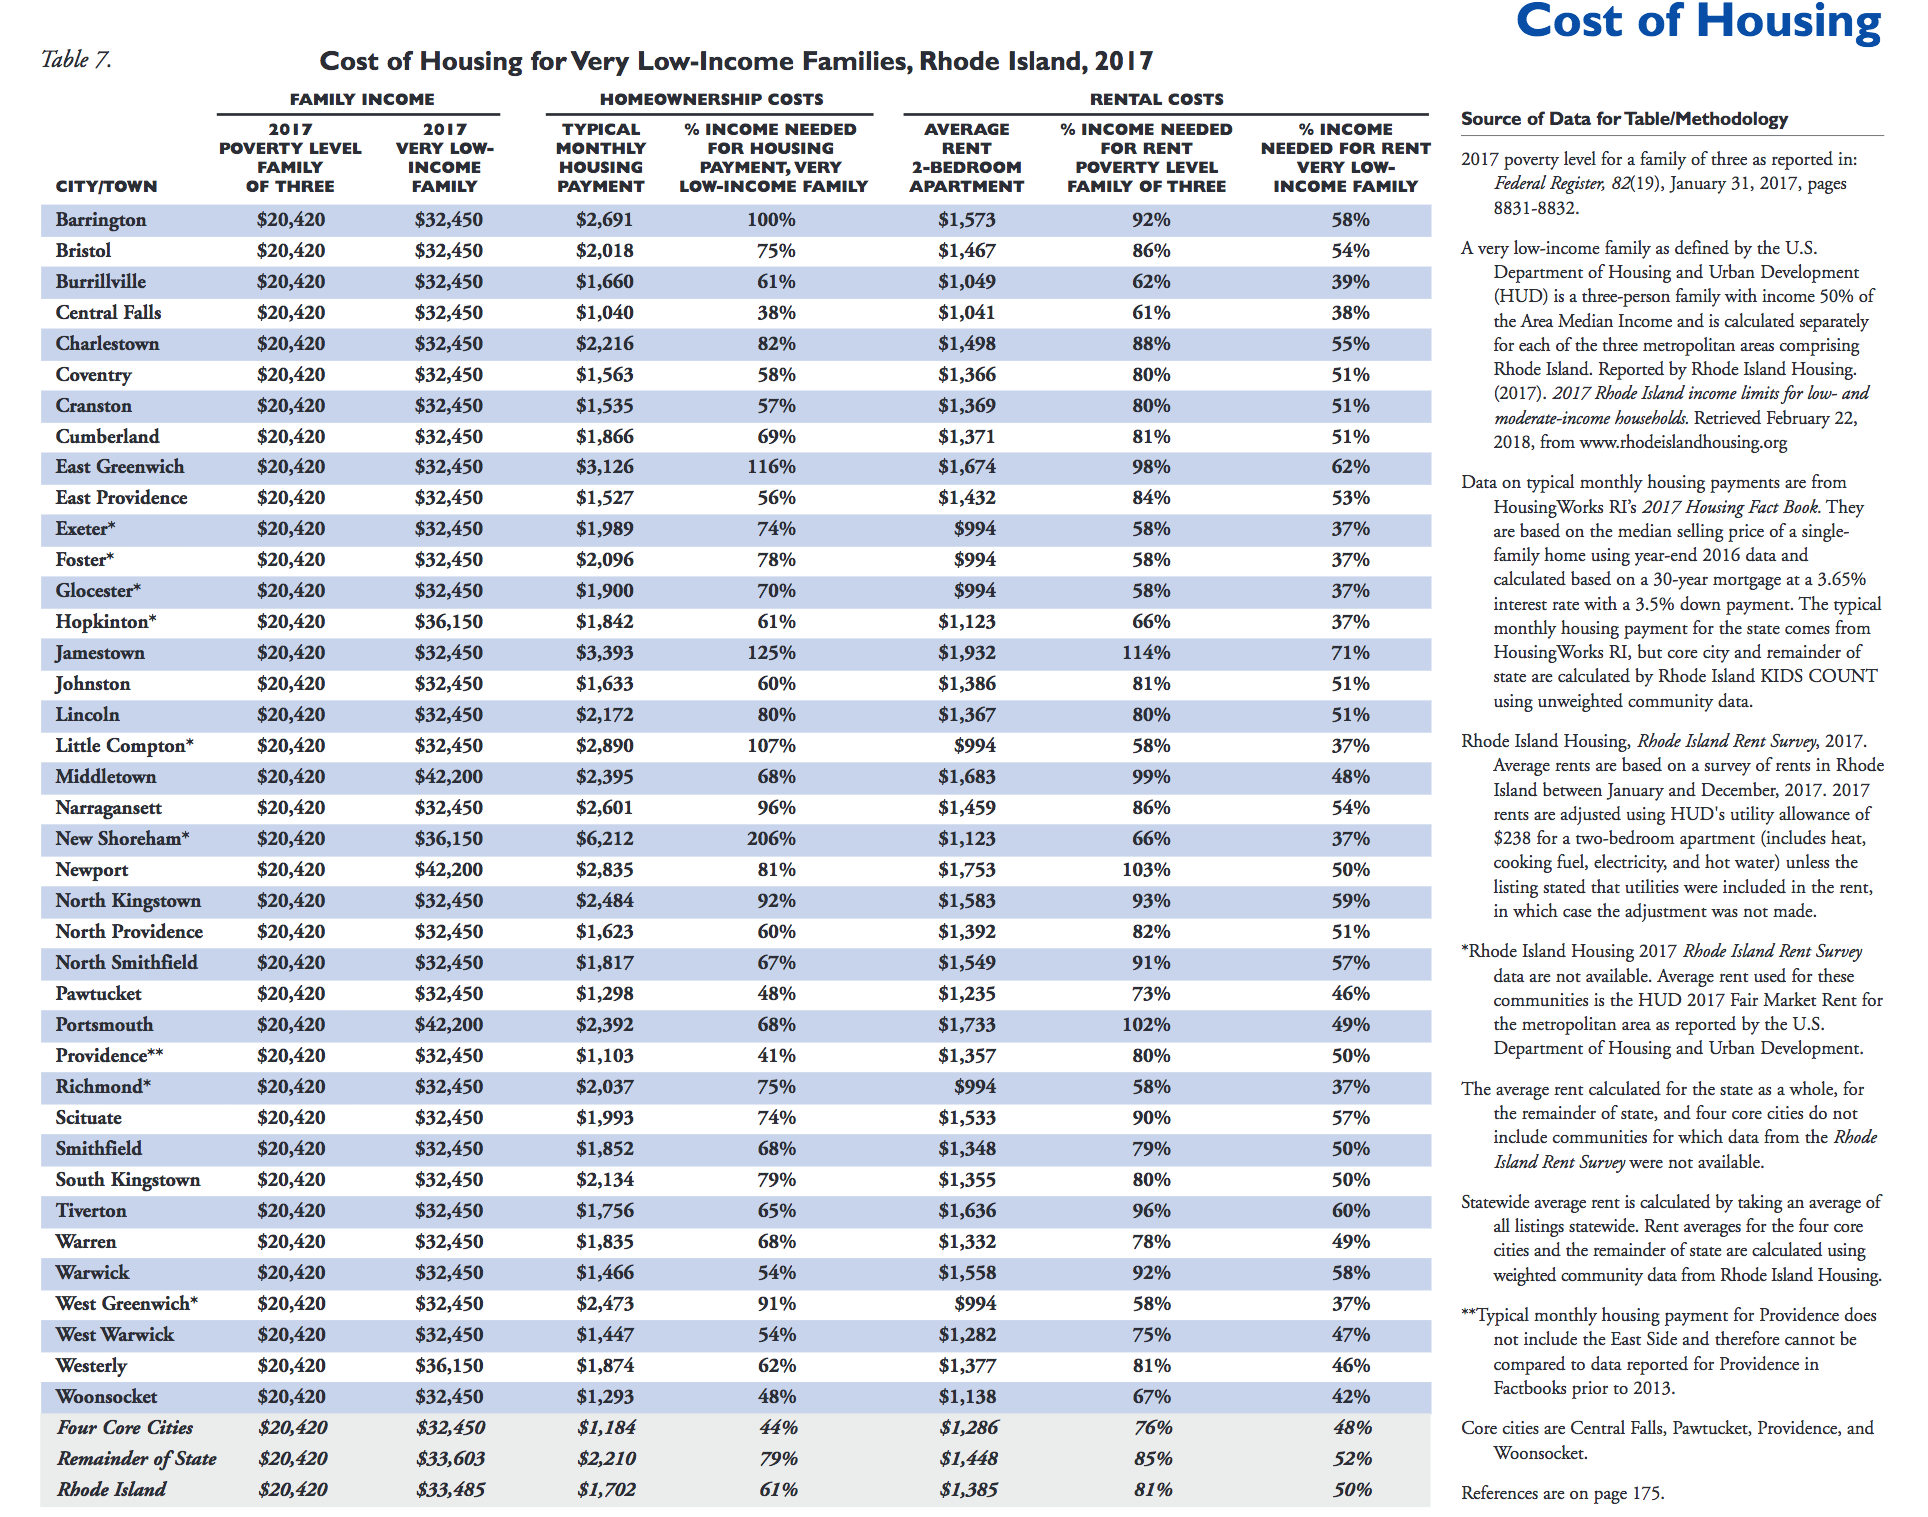 Cost of housing in RI